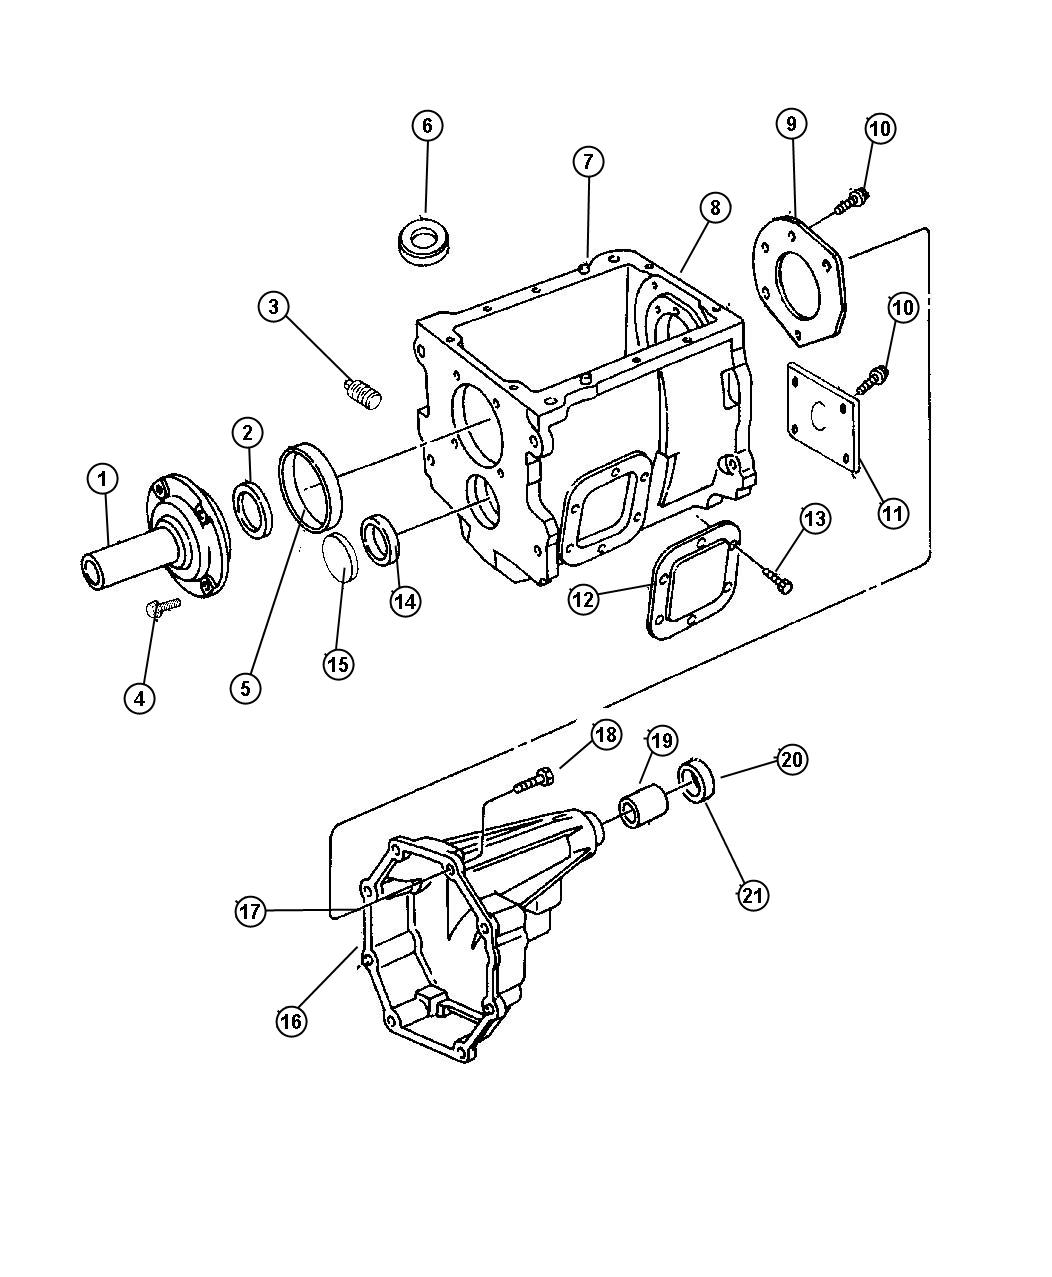 1998 Dodge Ram 3500 Plug. Countershaft. Ddpddx